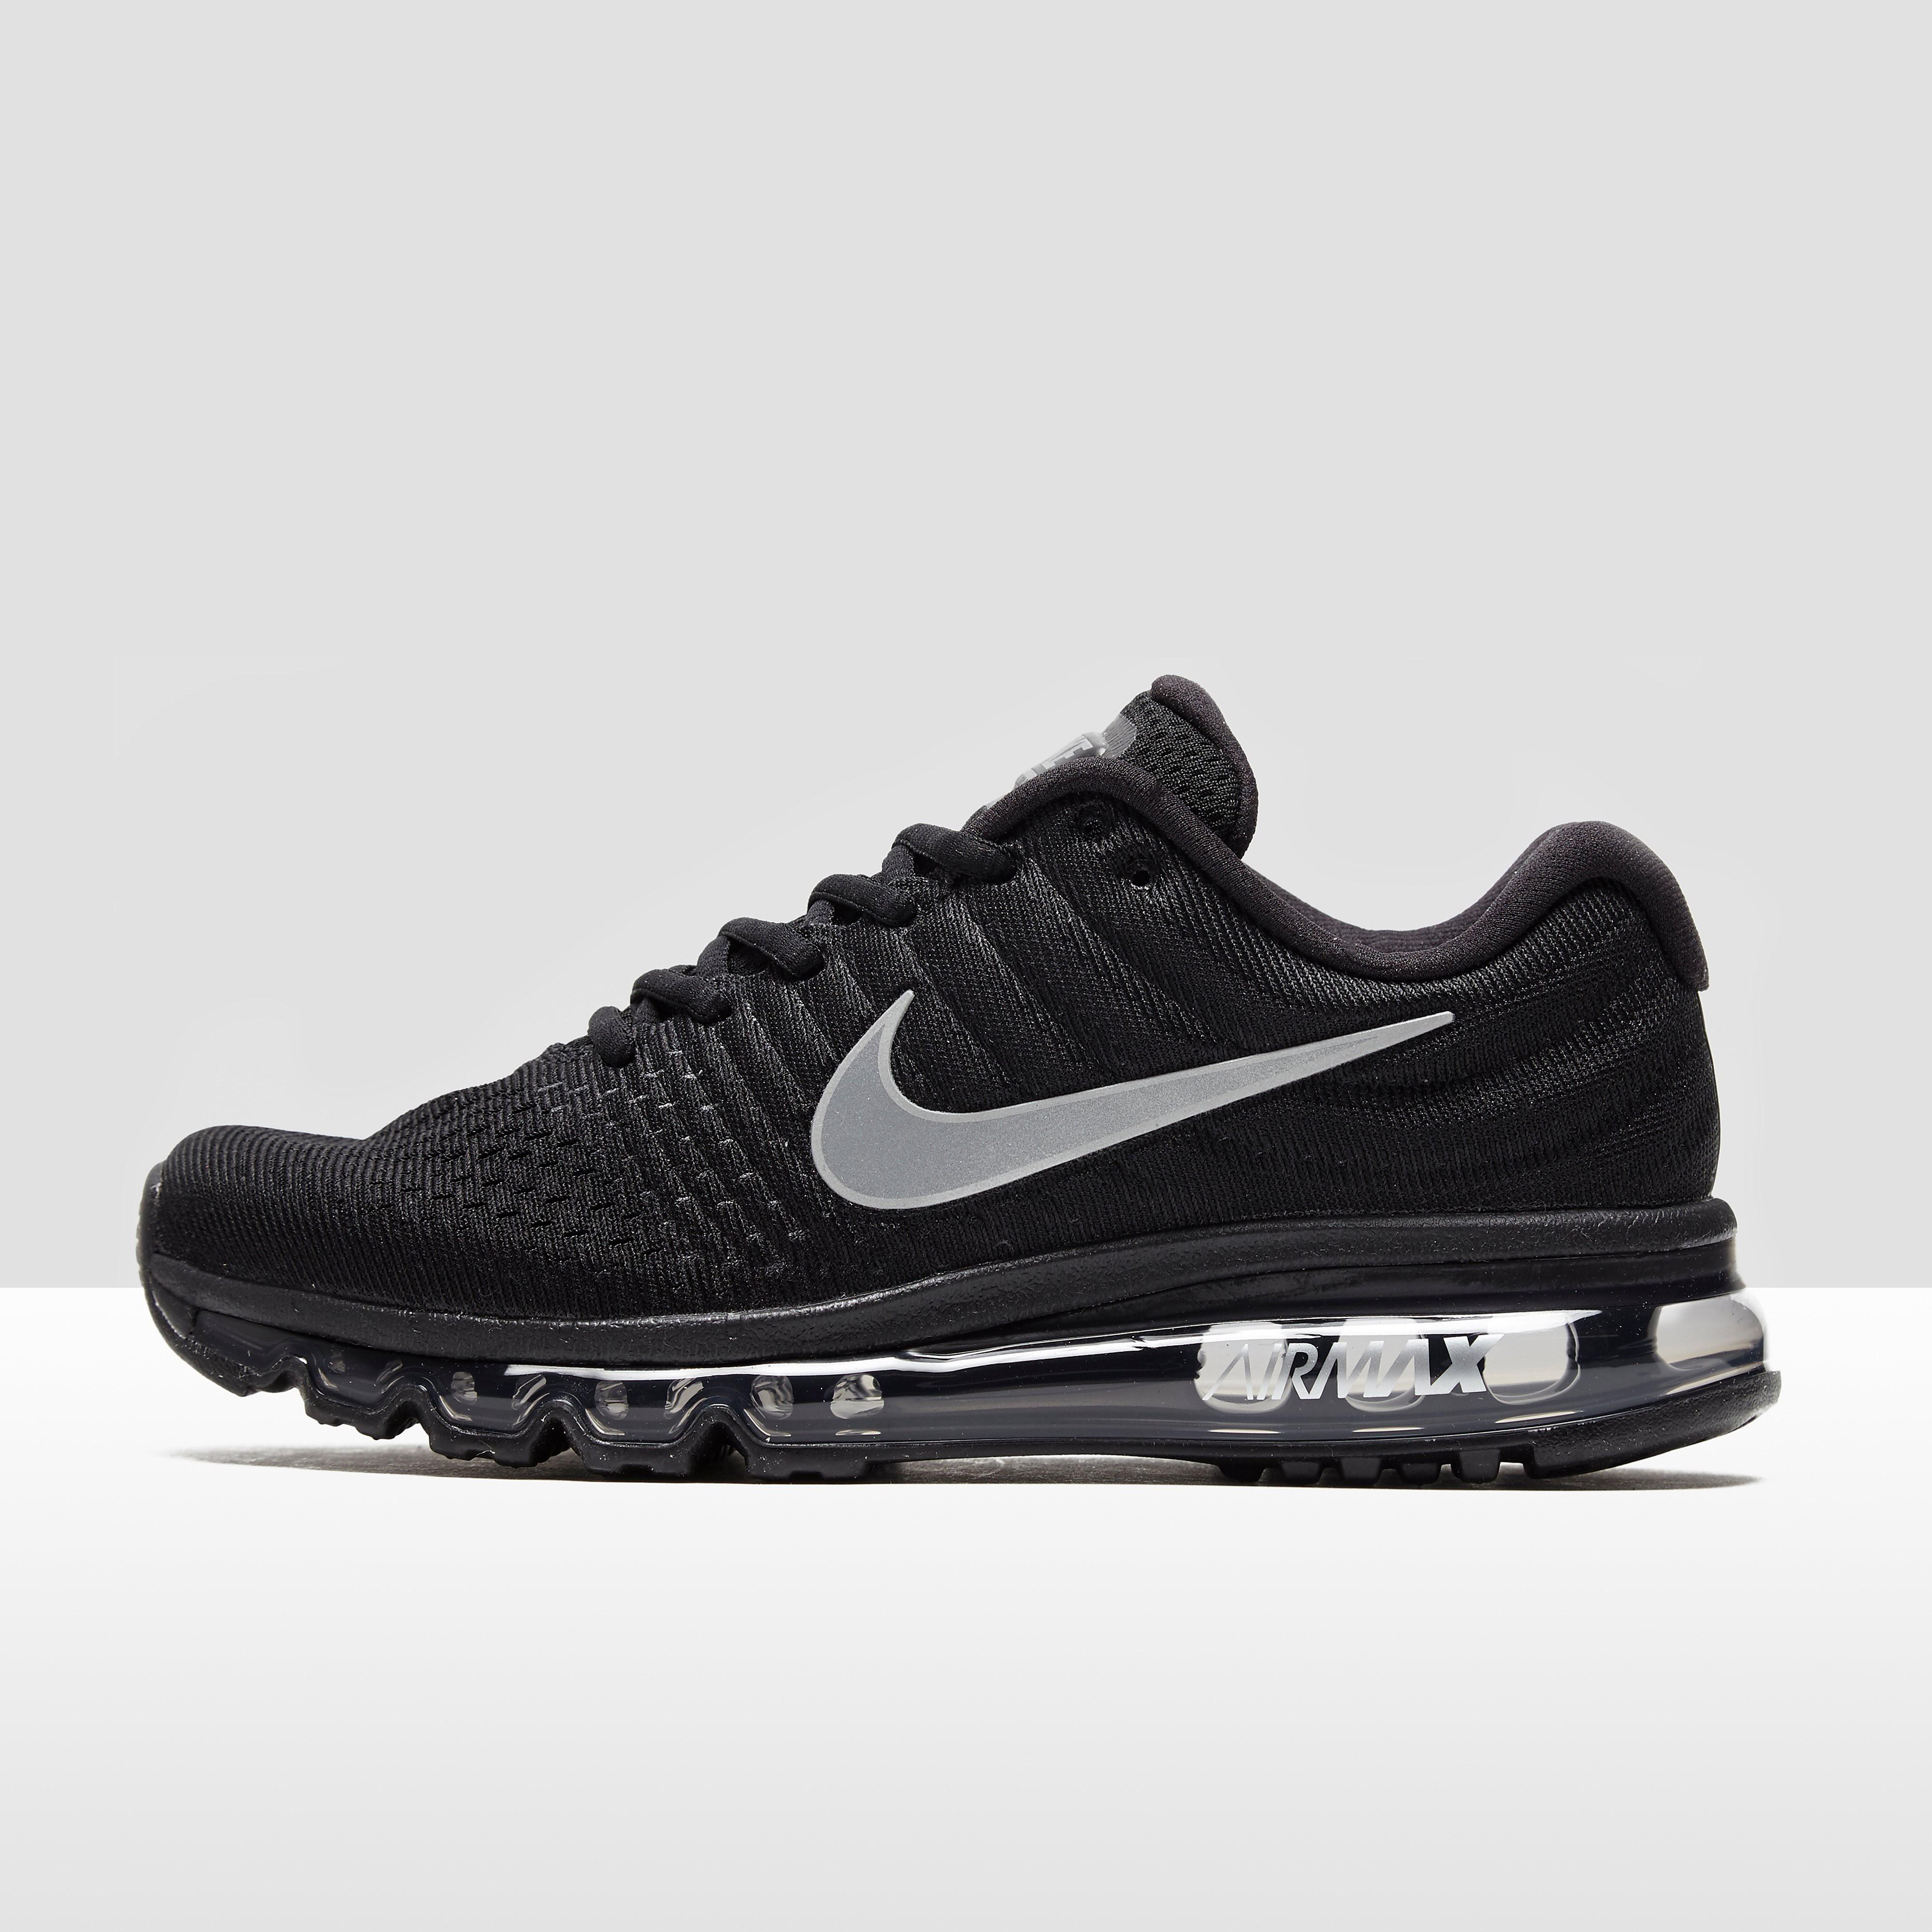 Nike Air Max 2017 Women's Running Shoes